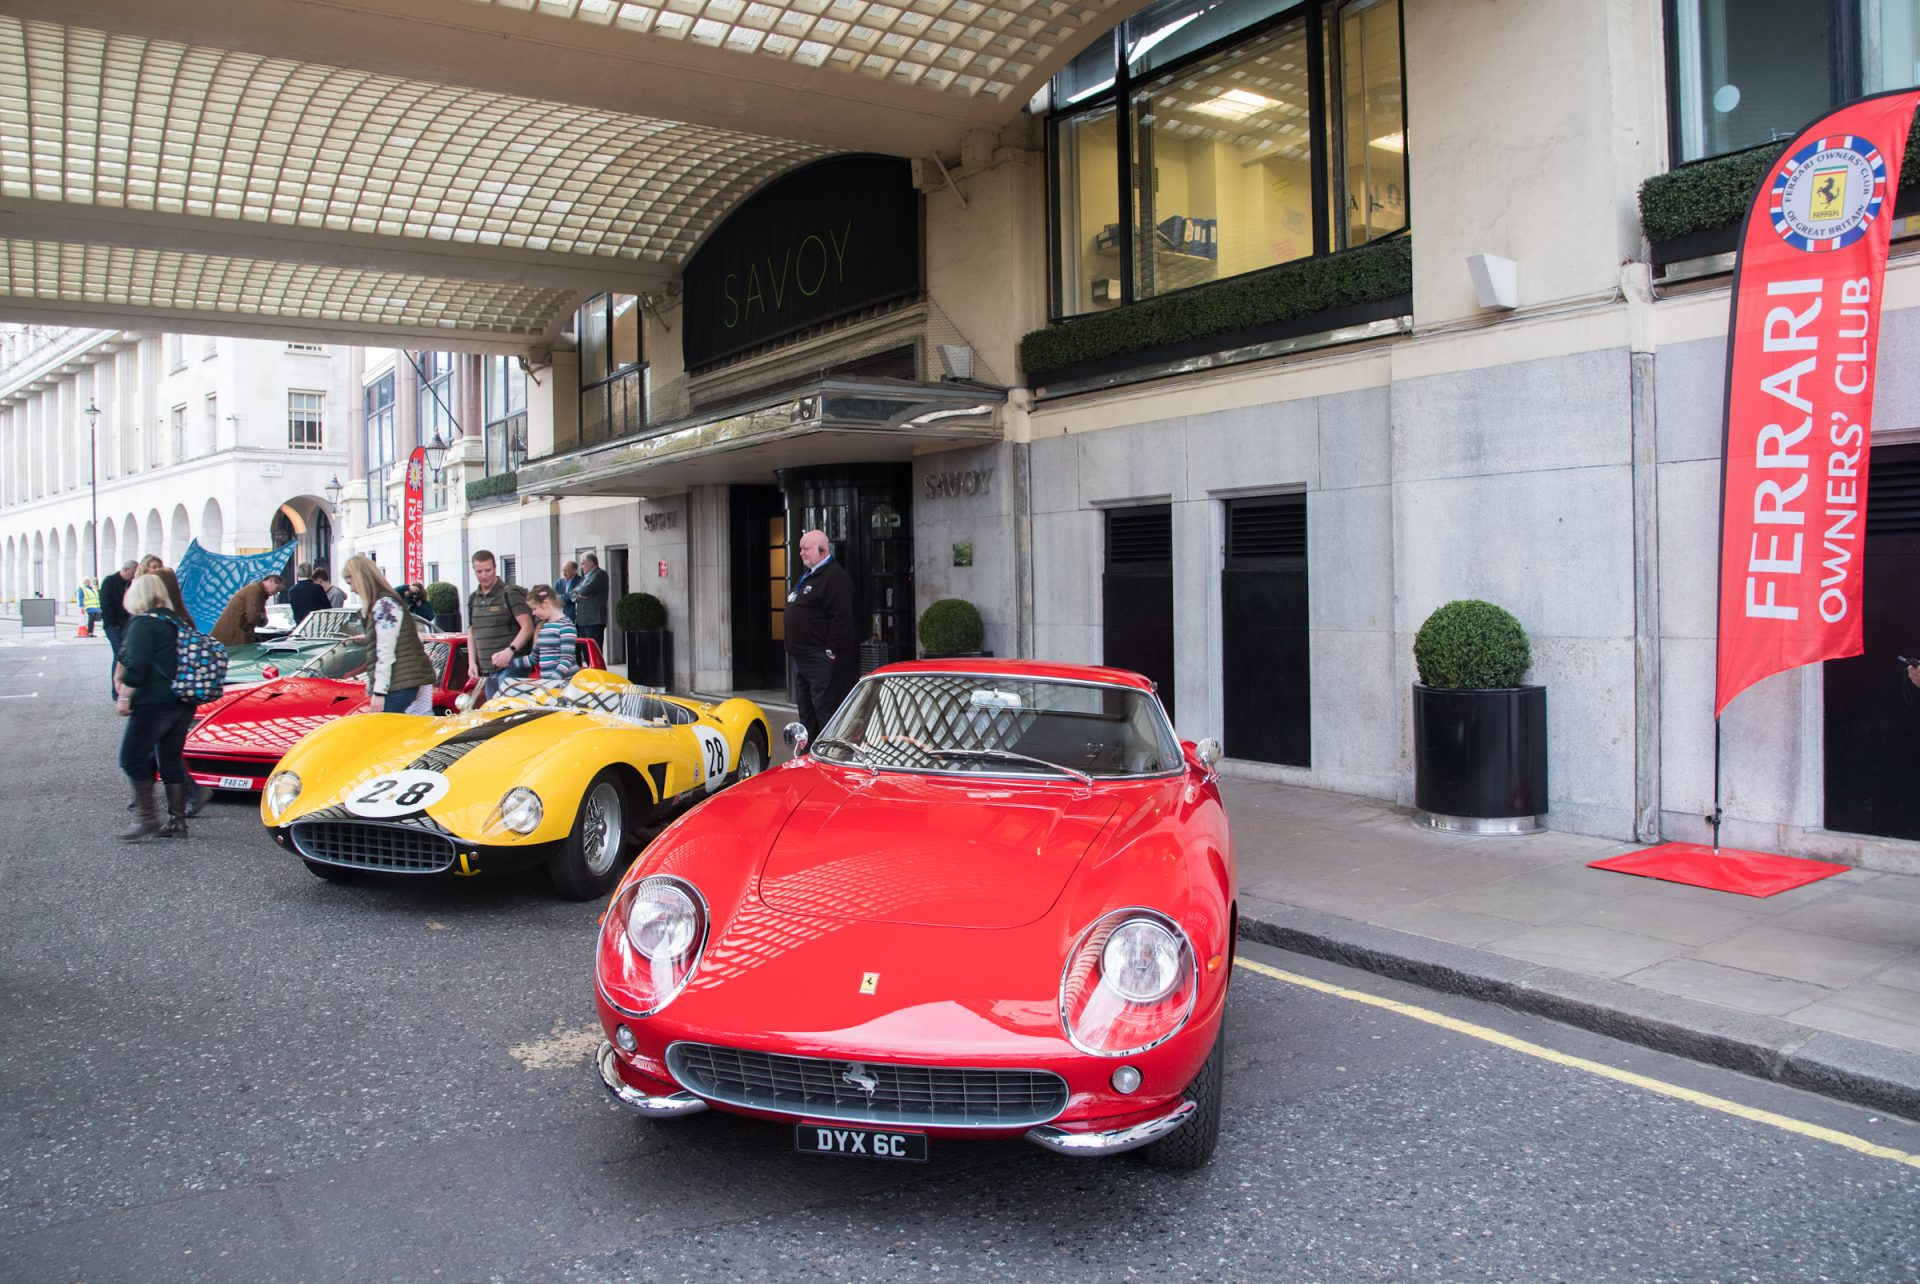 Ferrari Owners  Club GB Celebrates 50th Anniversary - Oracle Finance 6e80906a81ef